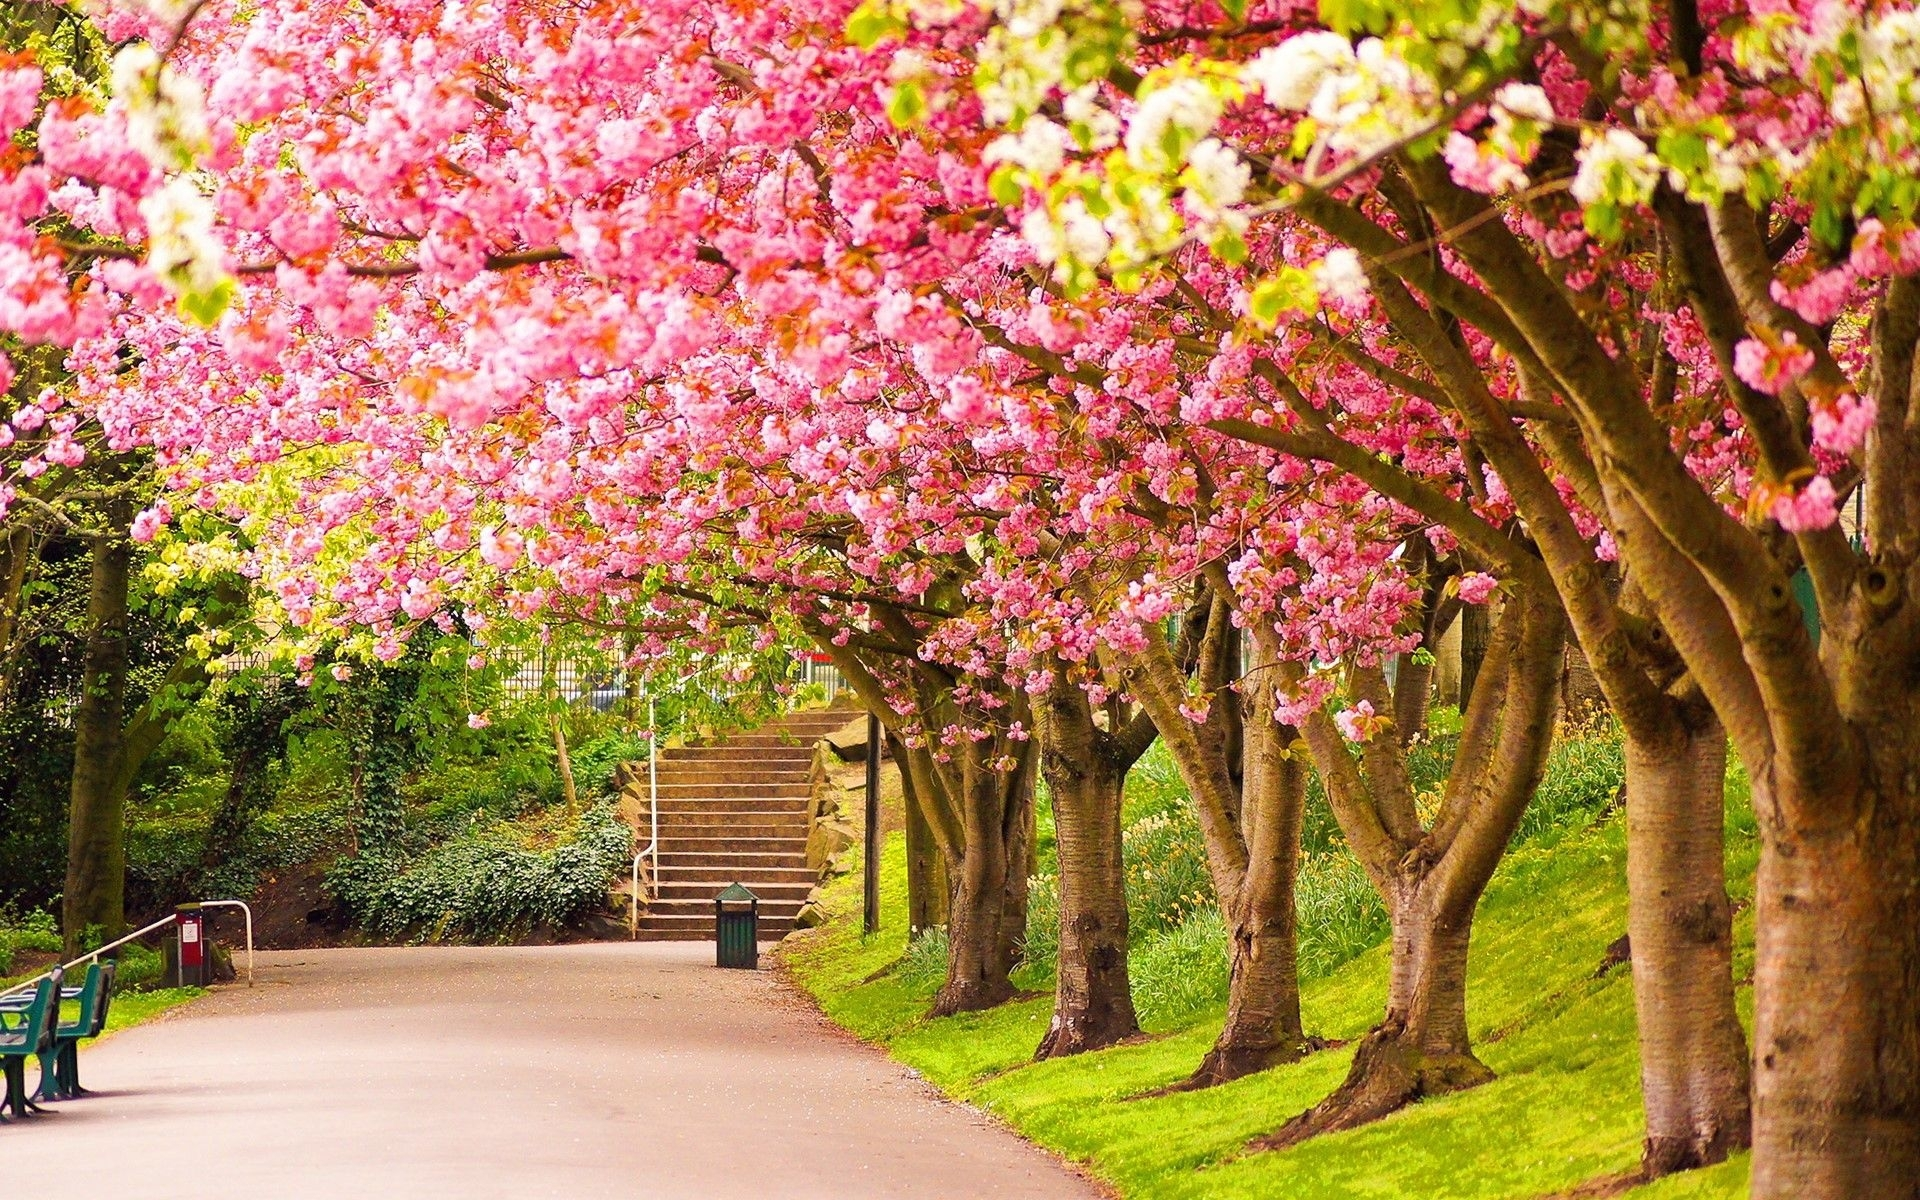 spring nature desktop wallpaper. | bunga | pinterest | nature